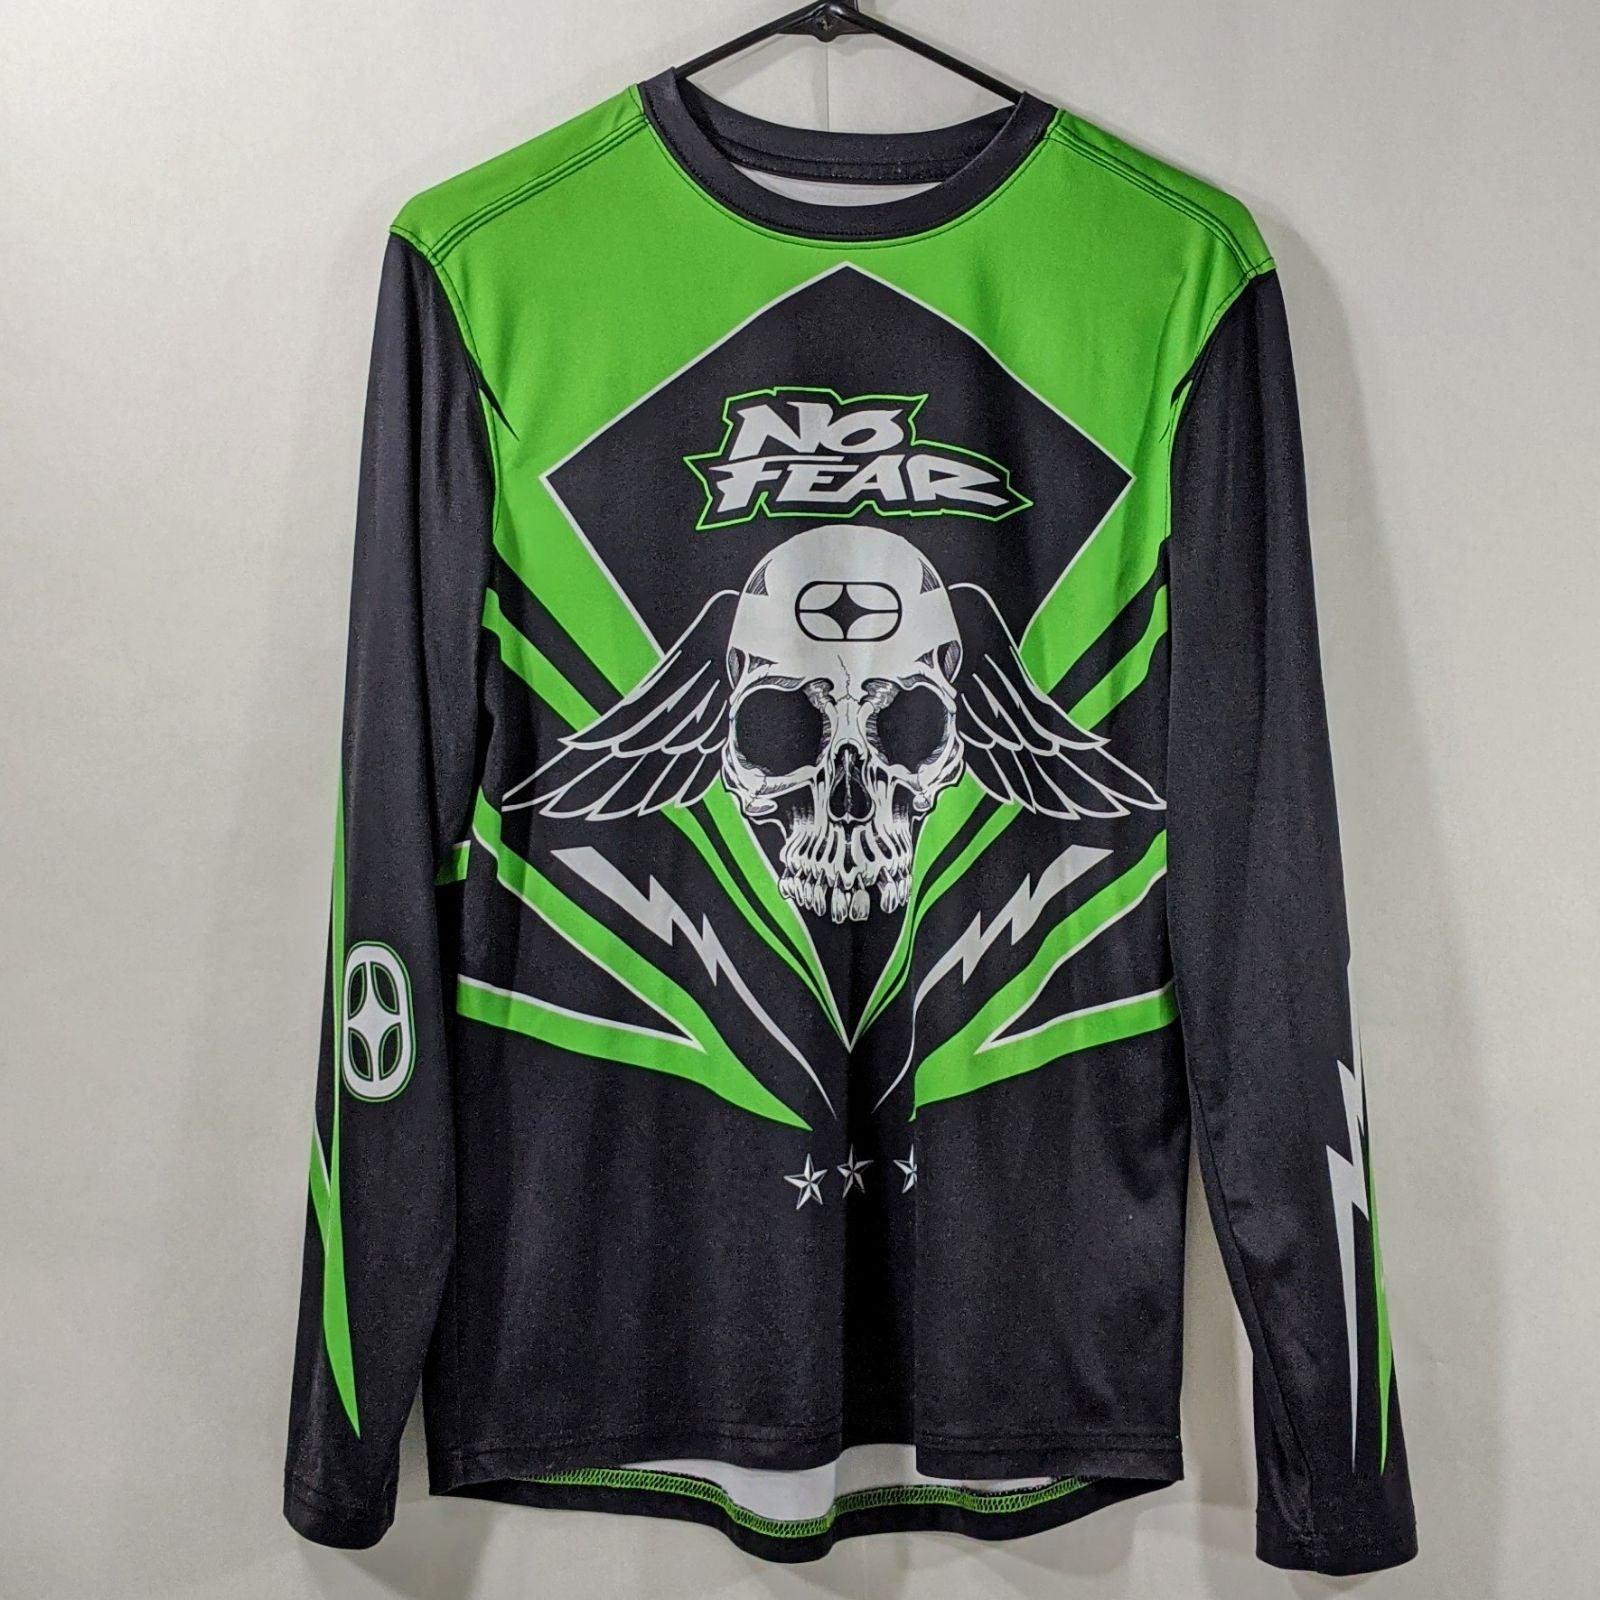 Vintage No Fear Motocross Jersey